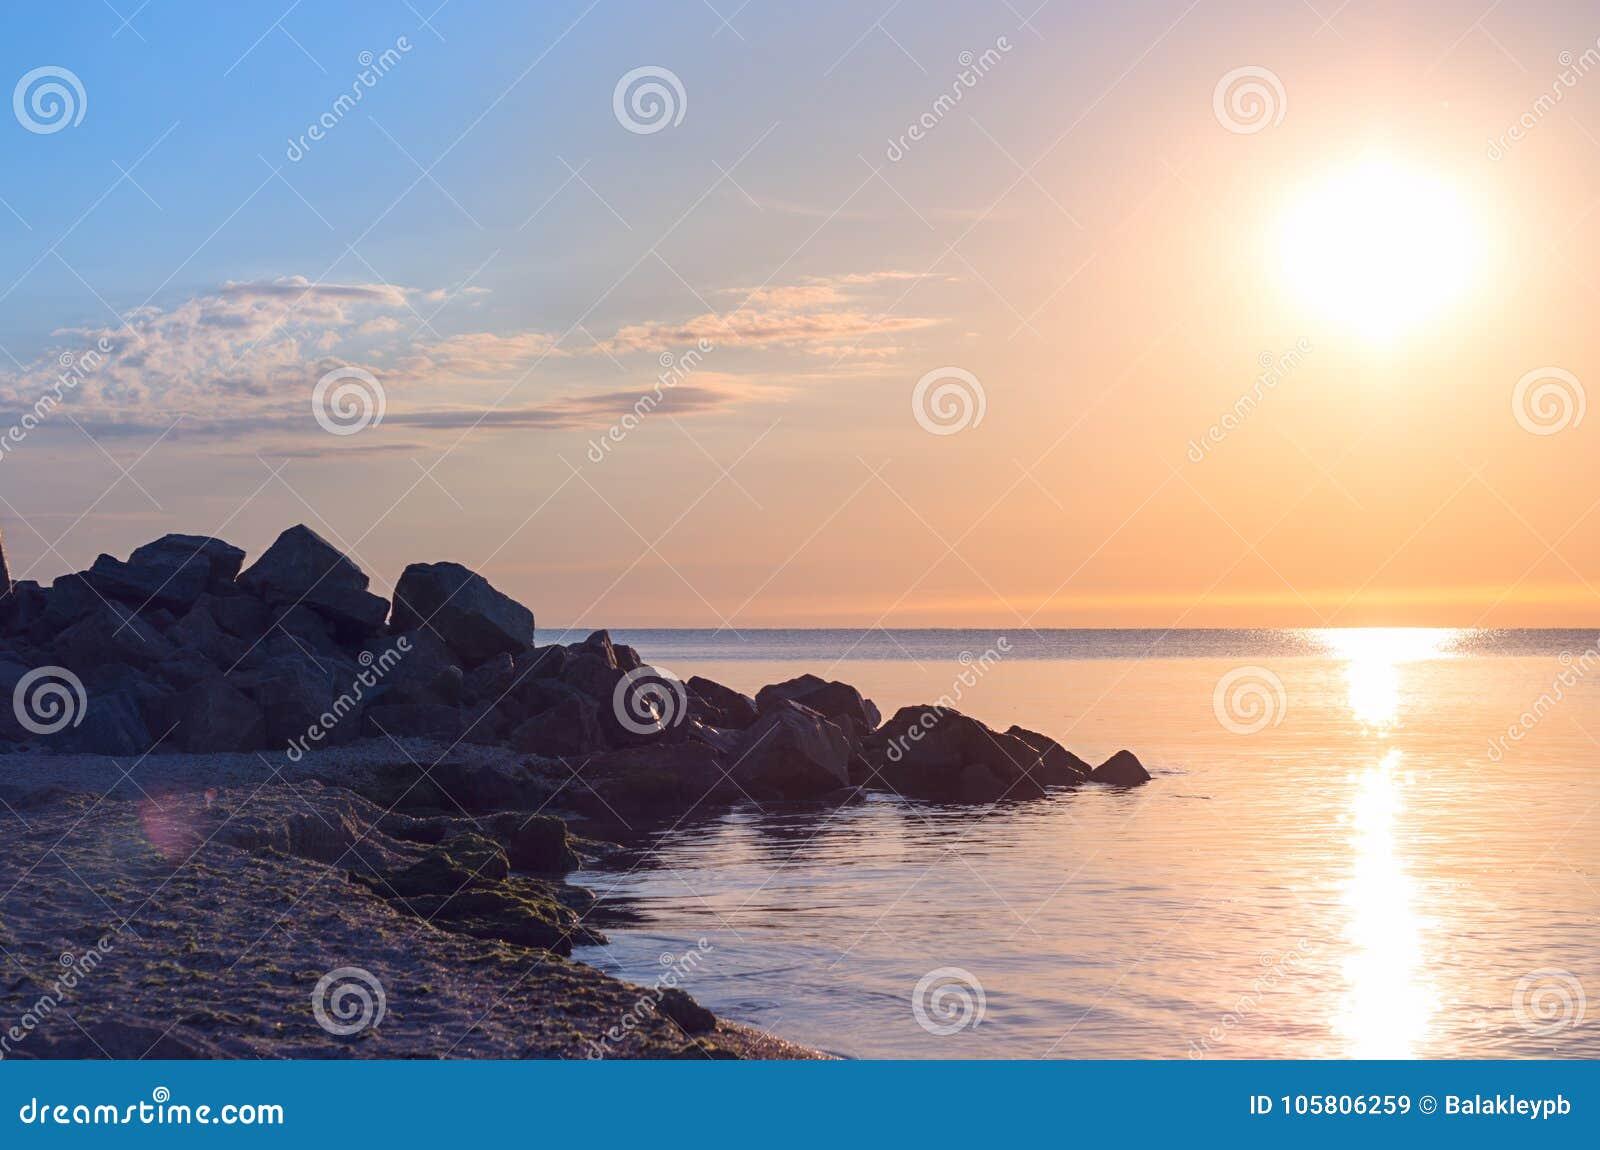 71b4a9453c Πέτρινη παραλία στην ακροθαλασσιά μπλε ουρανός οριζόντων Αντανάκλαση της  ανατολής τονισμένος